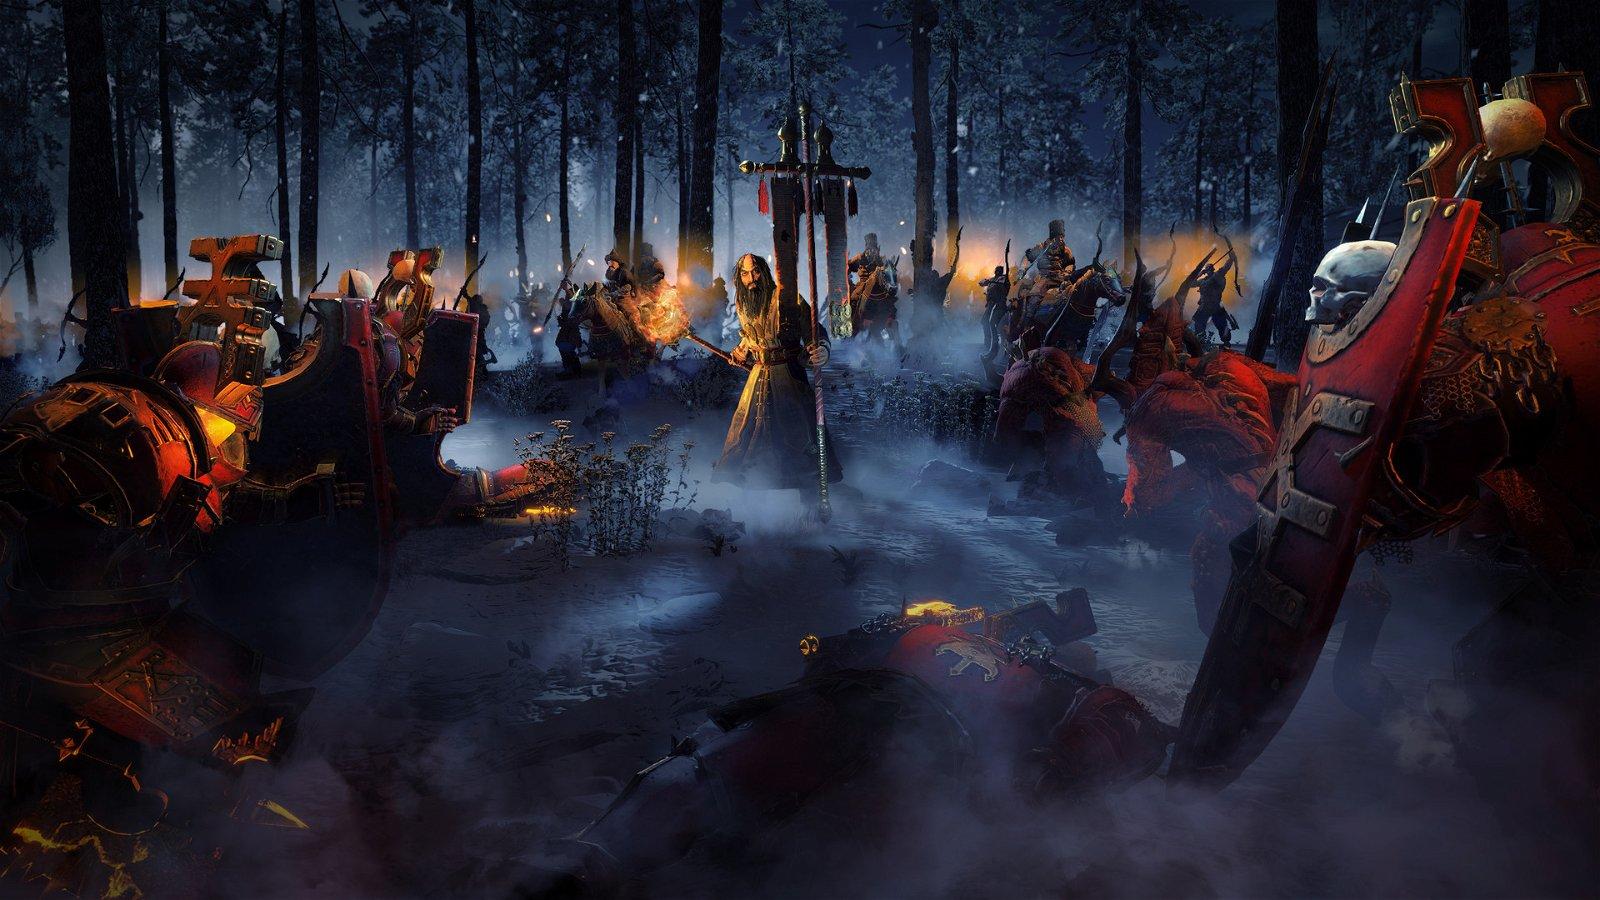 Total War: Warhammer III Gets Delayed Into 2022